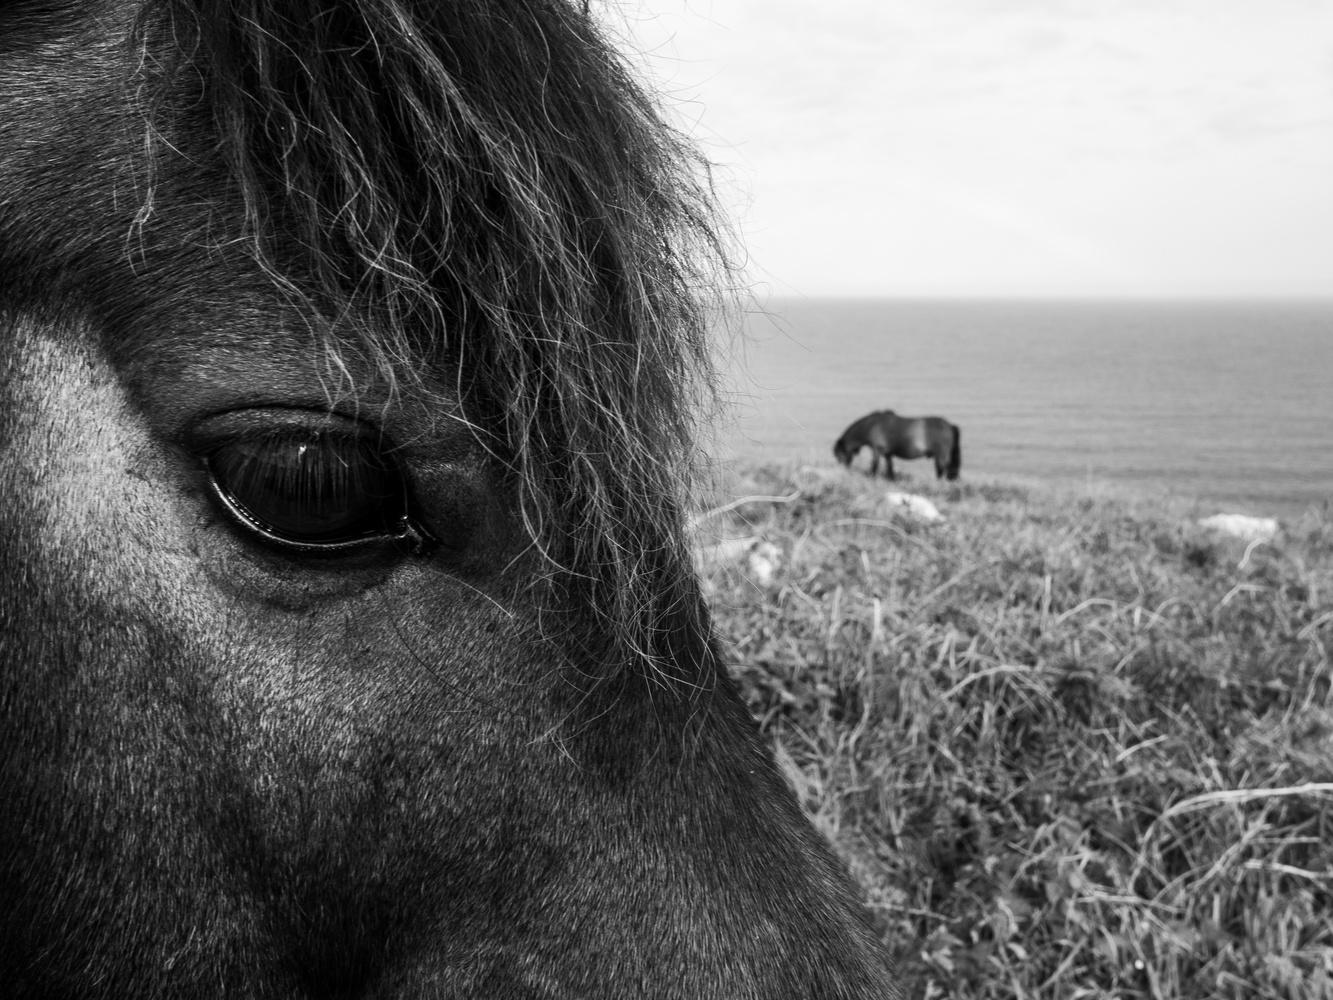 On the coast by Tomasz Kowalski